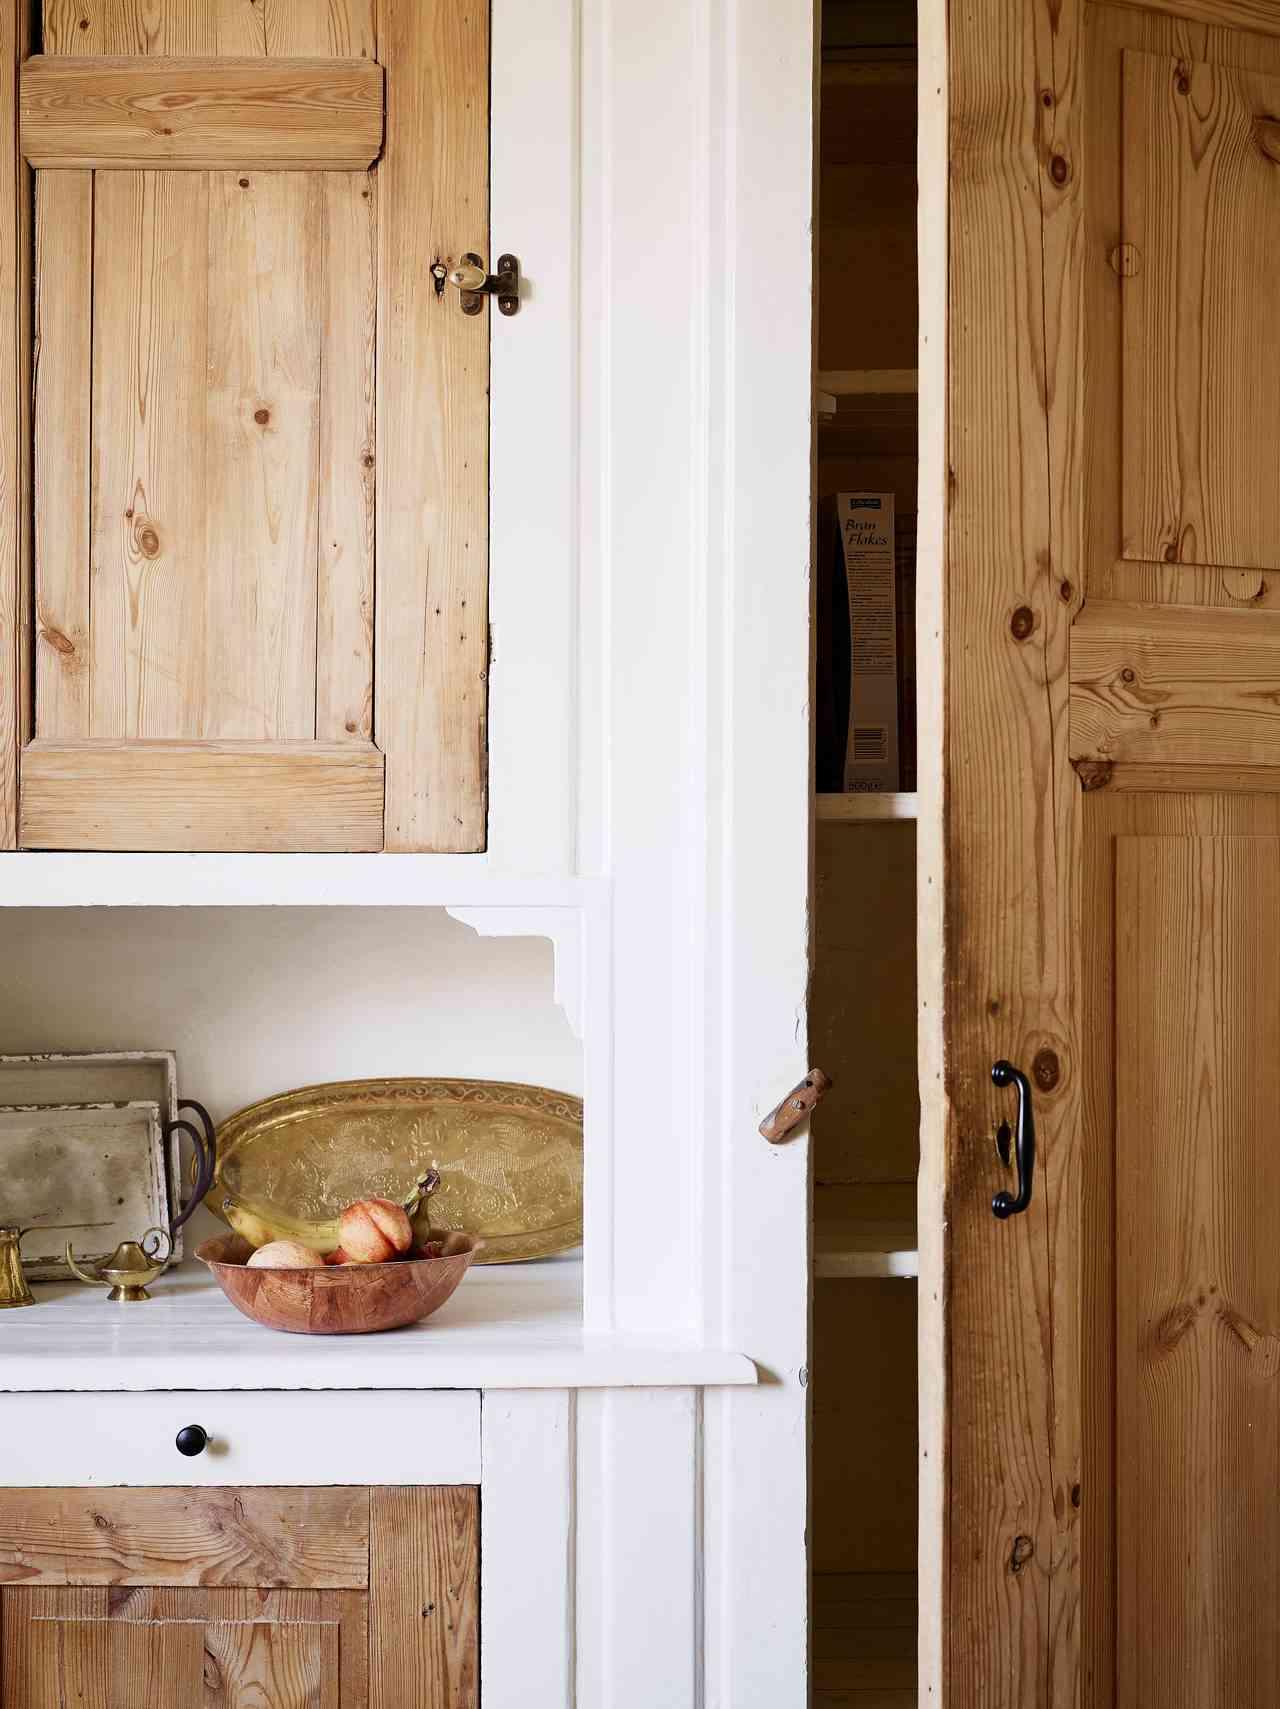 apartamento 32 metros - detalles de madera